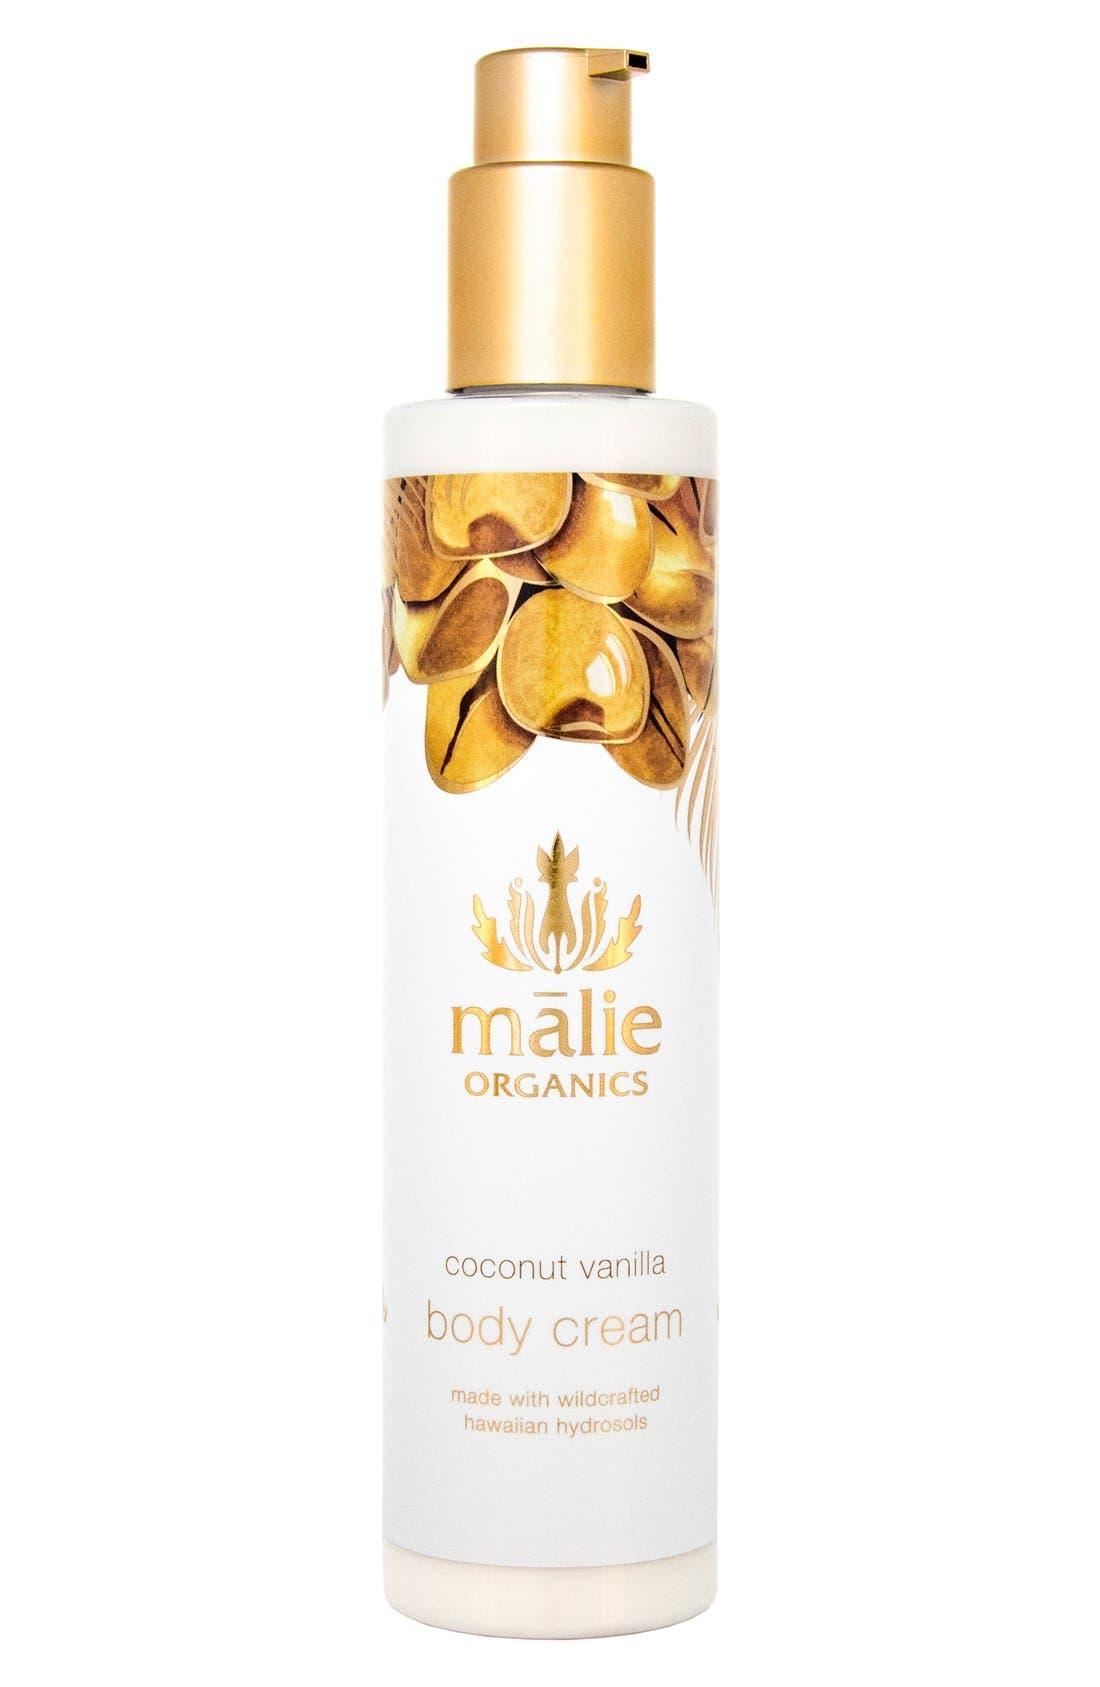 Malie Organics Coconut Vanilla Organic Body Cream